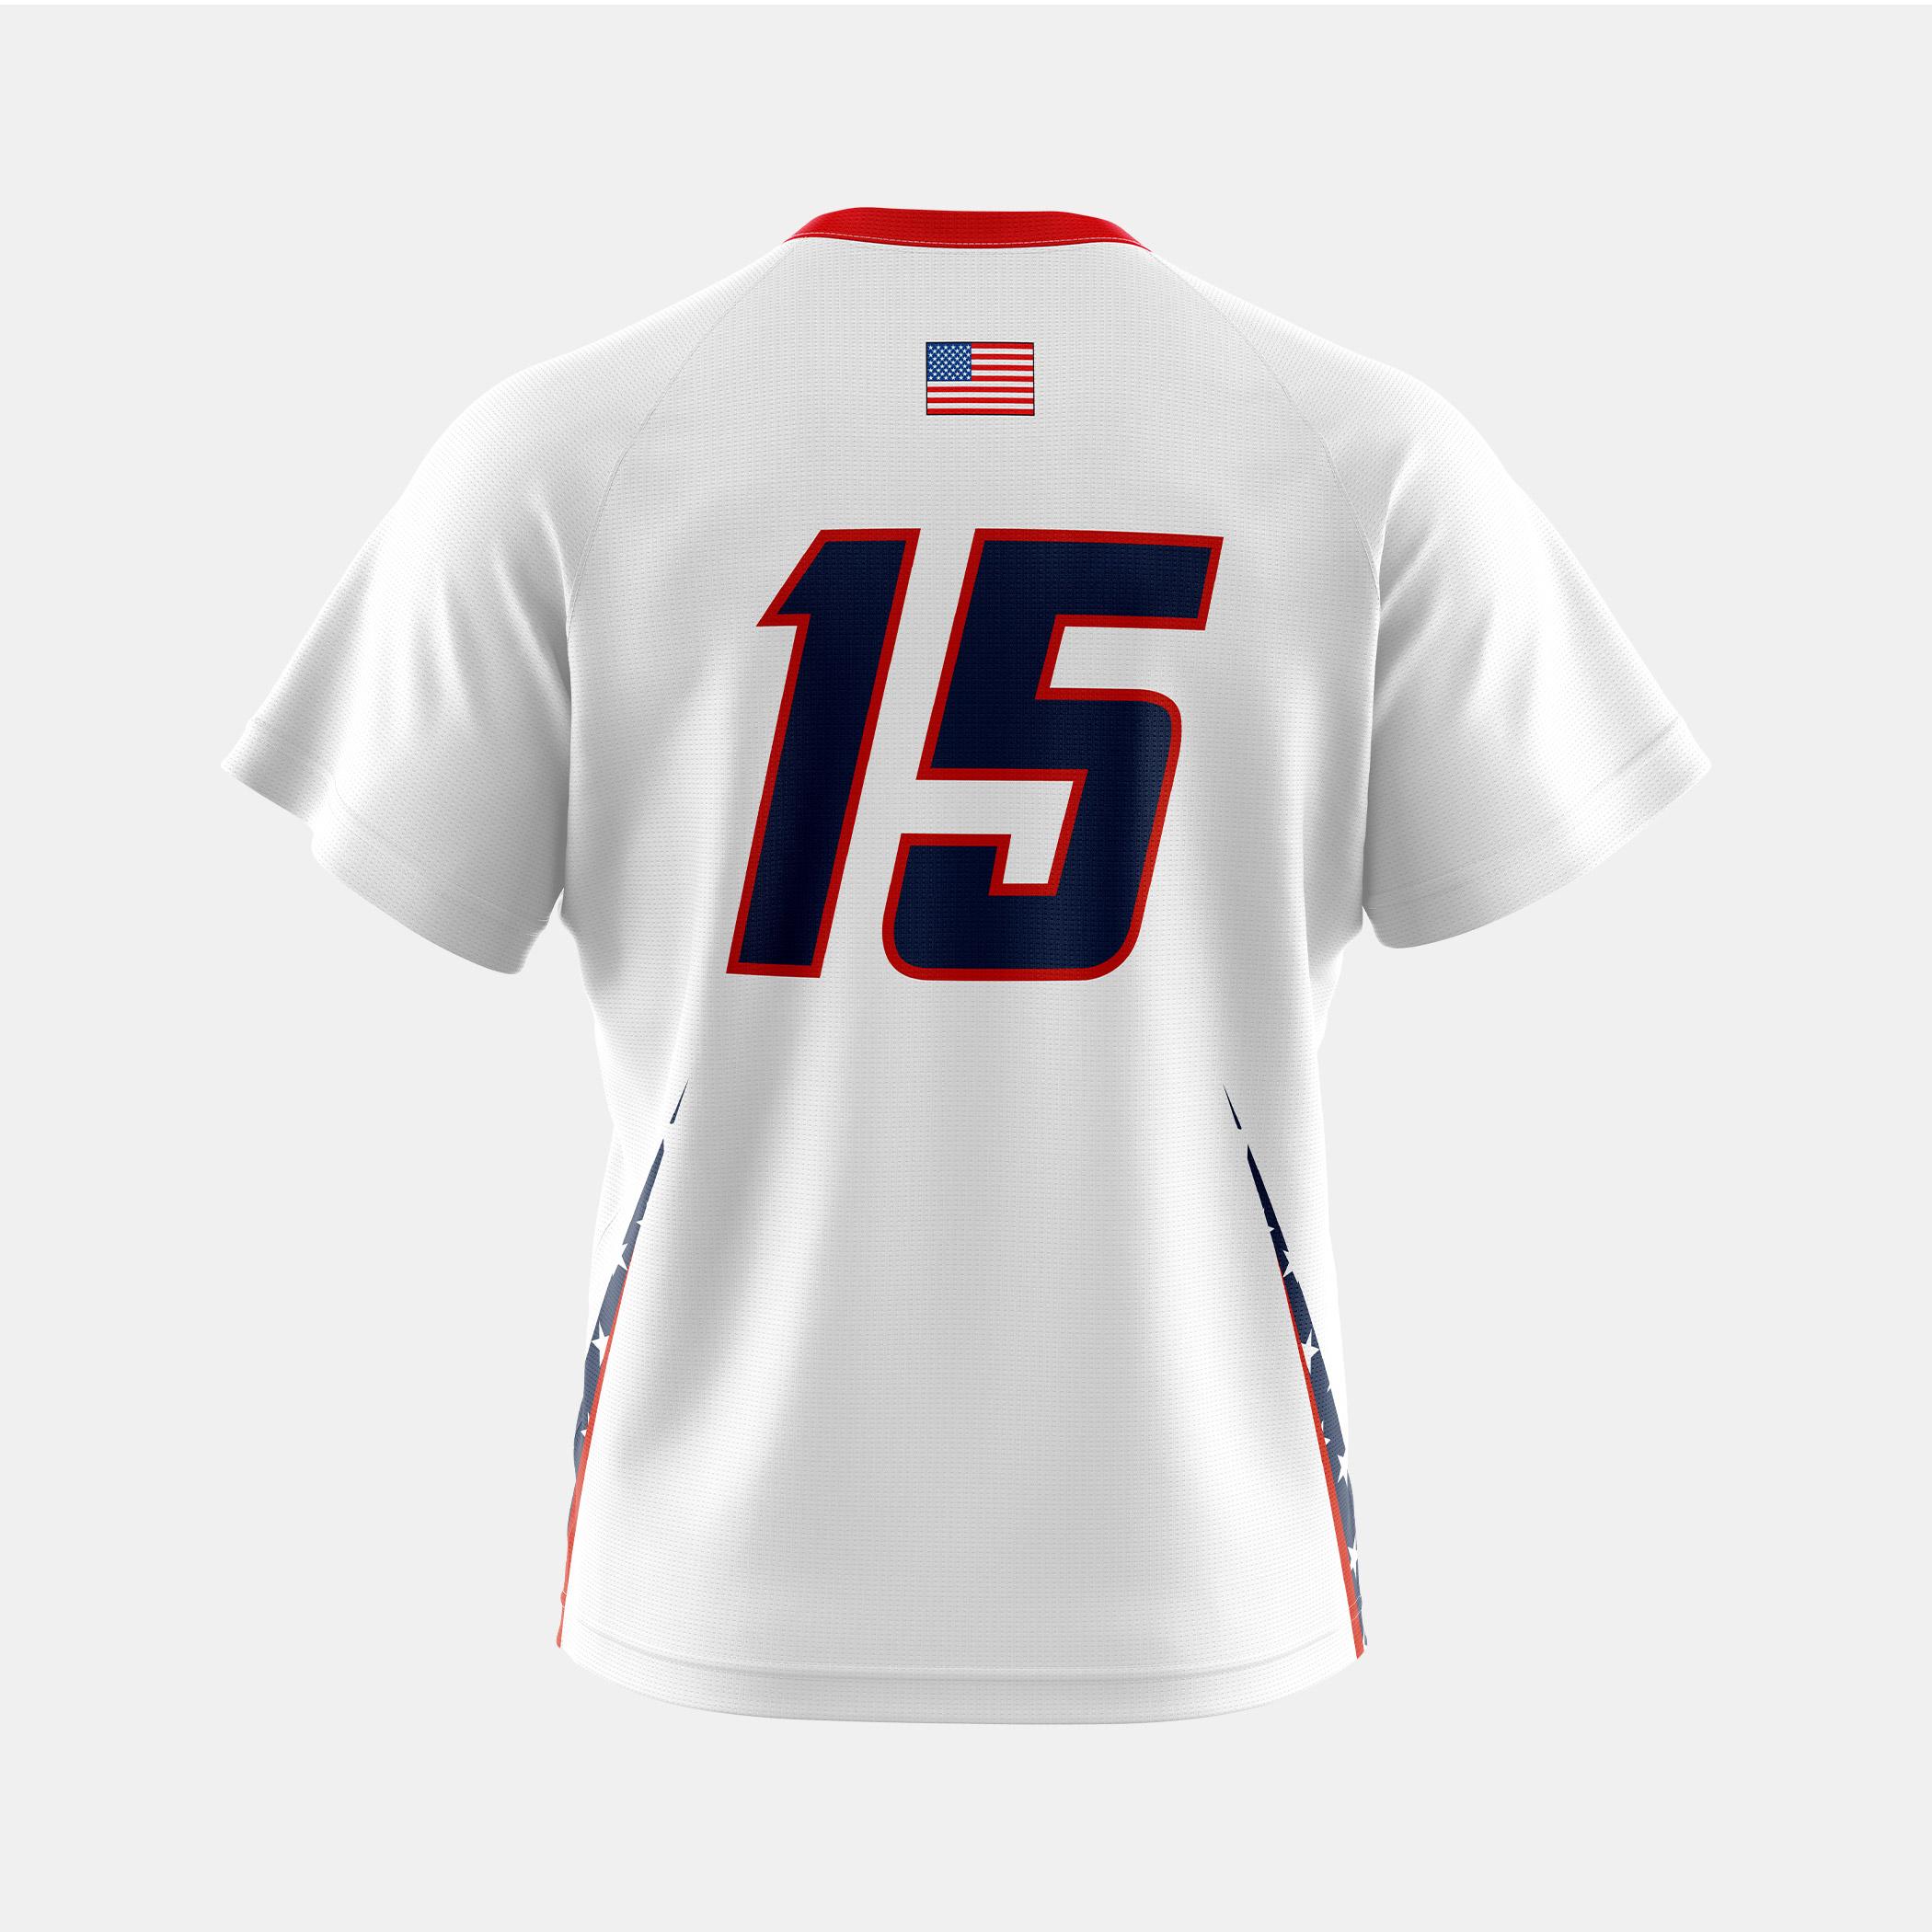 Patriots Jersey White Back